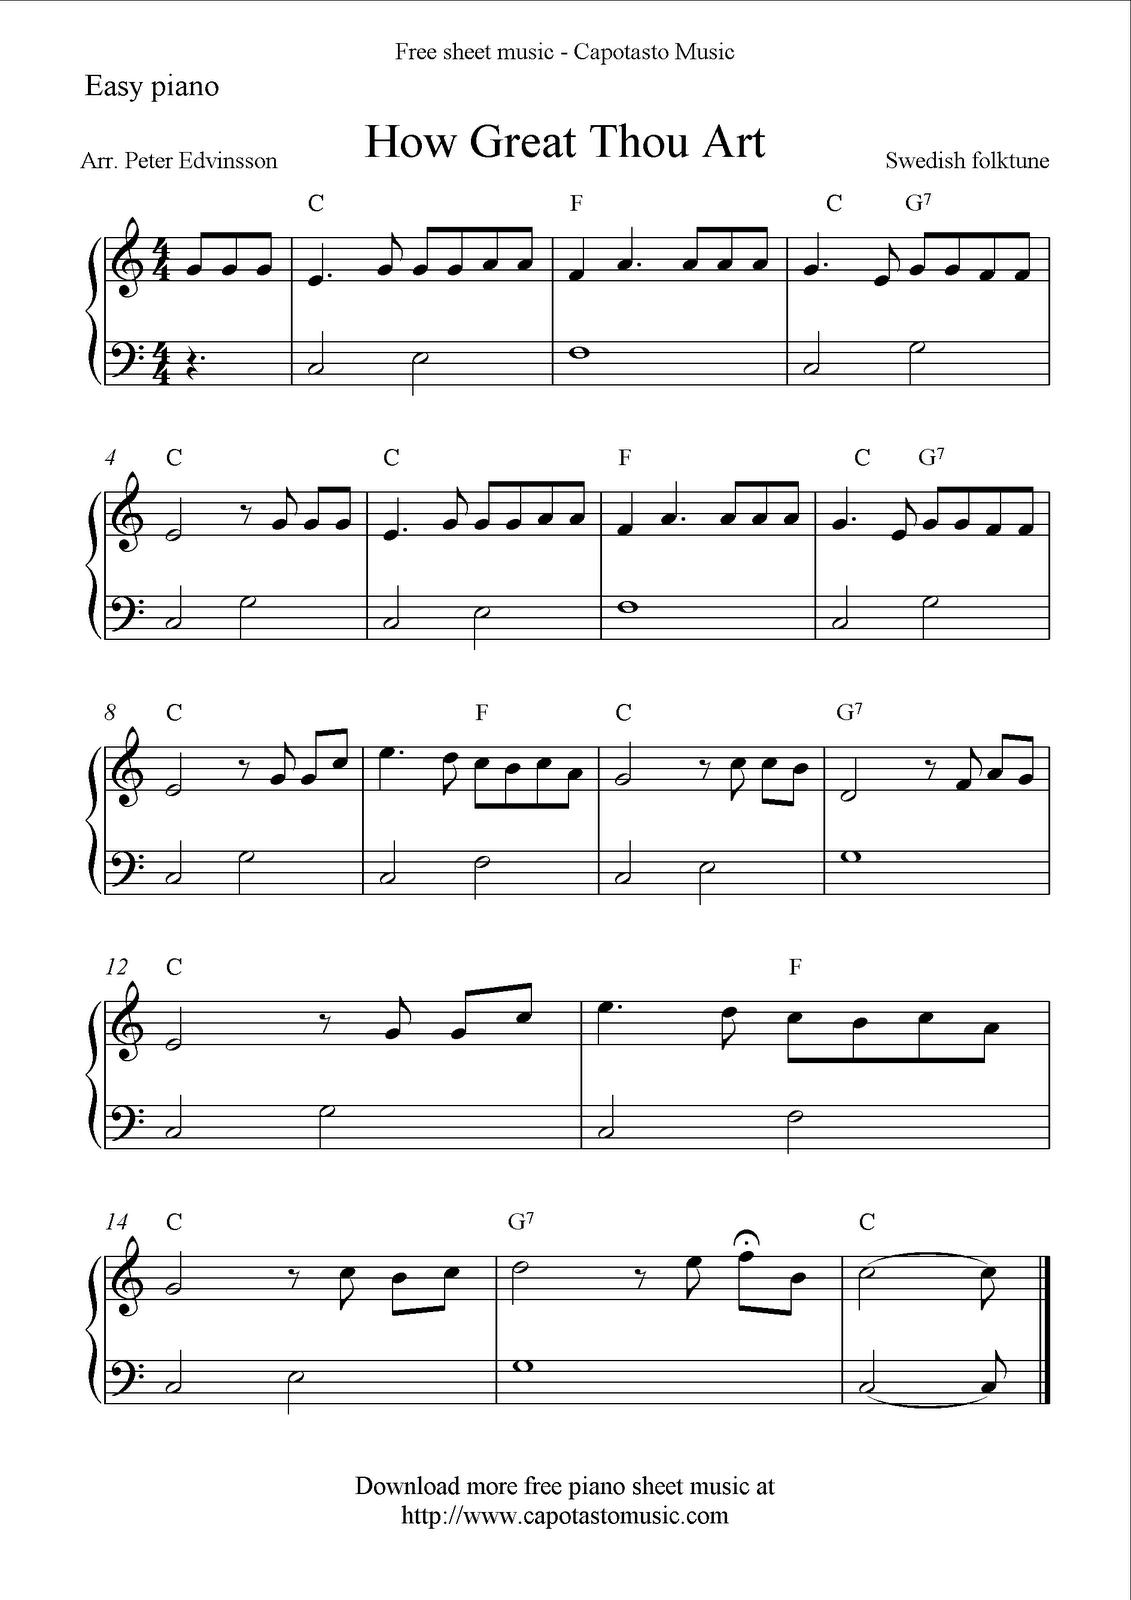 Download printable free easy sheet music scores, guitar